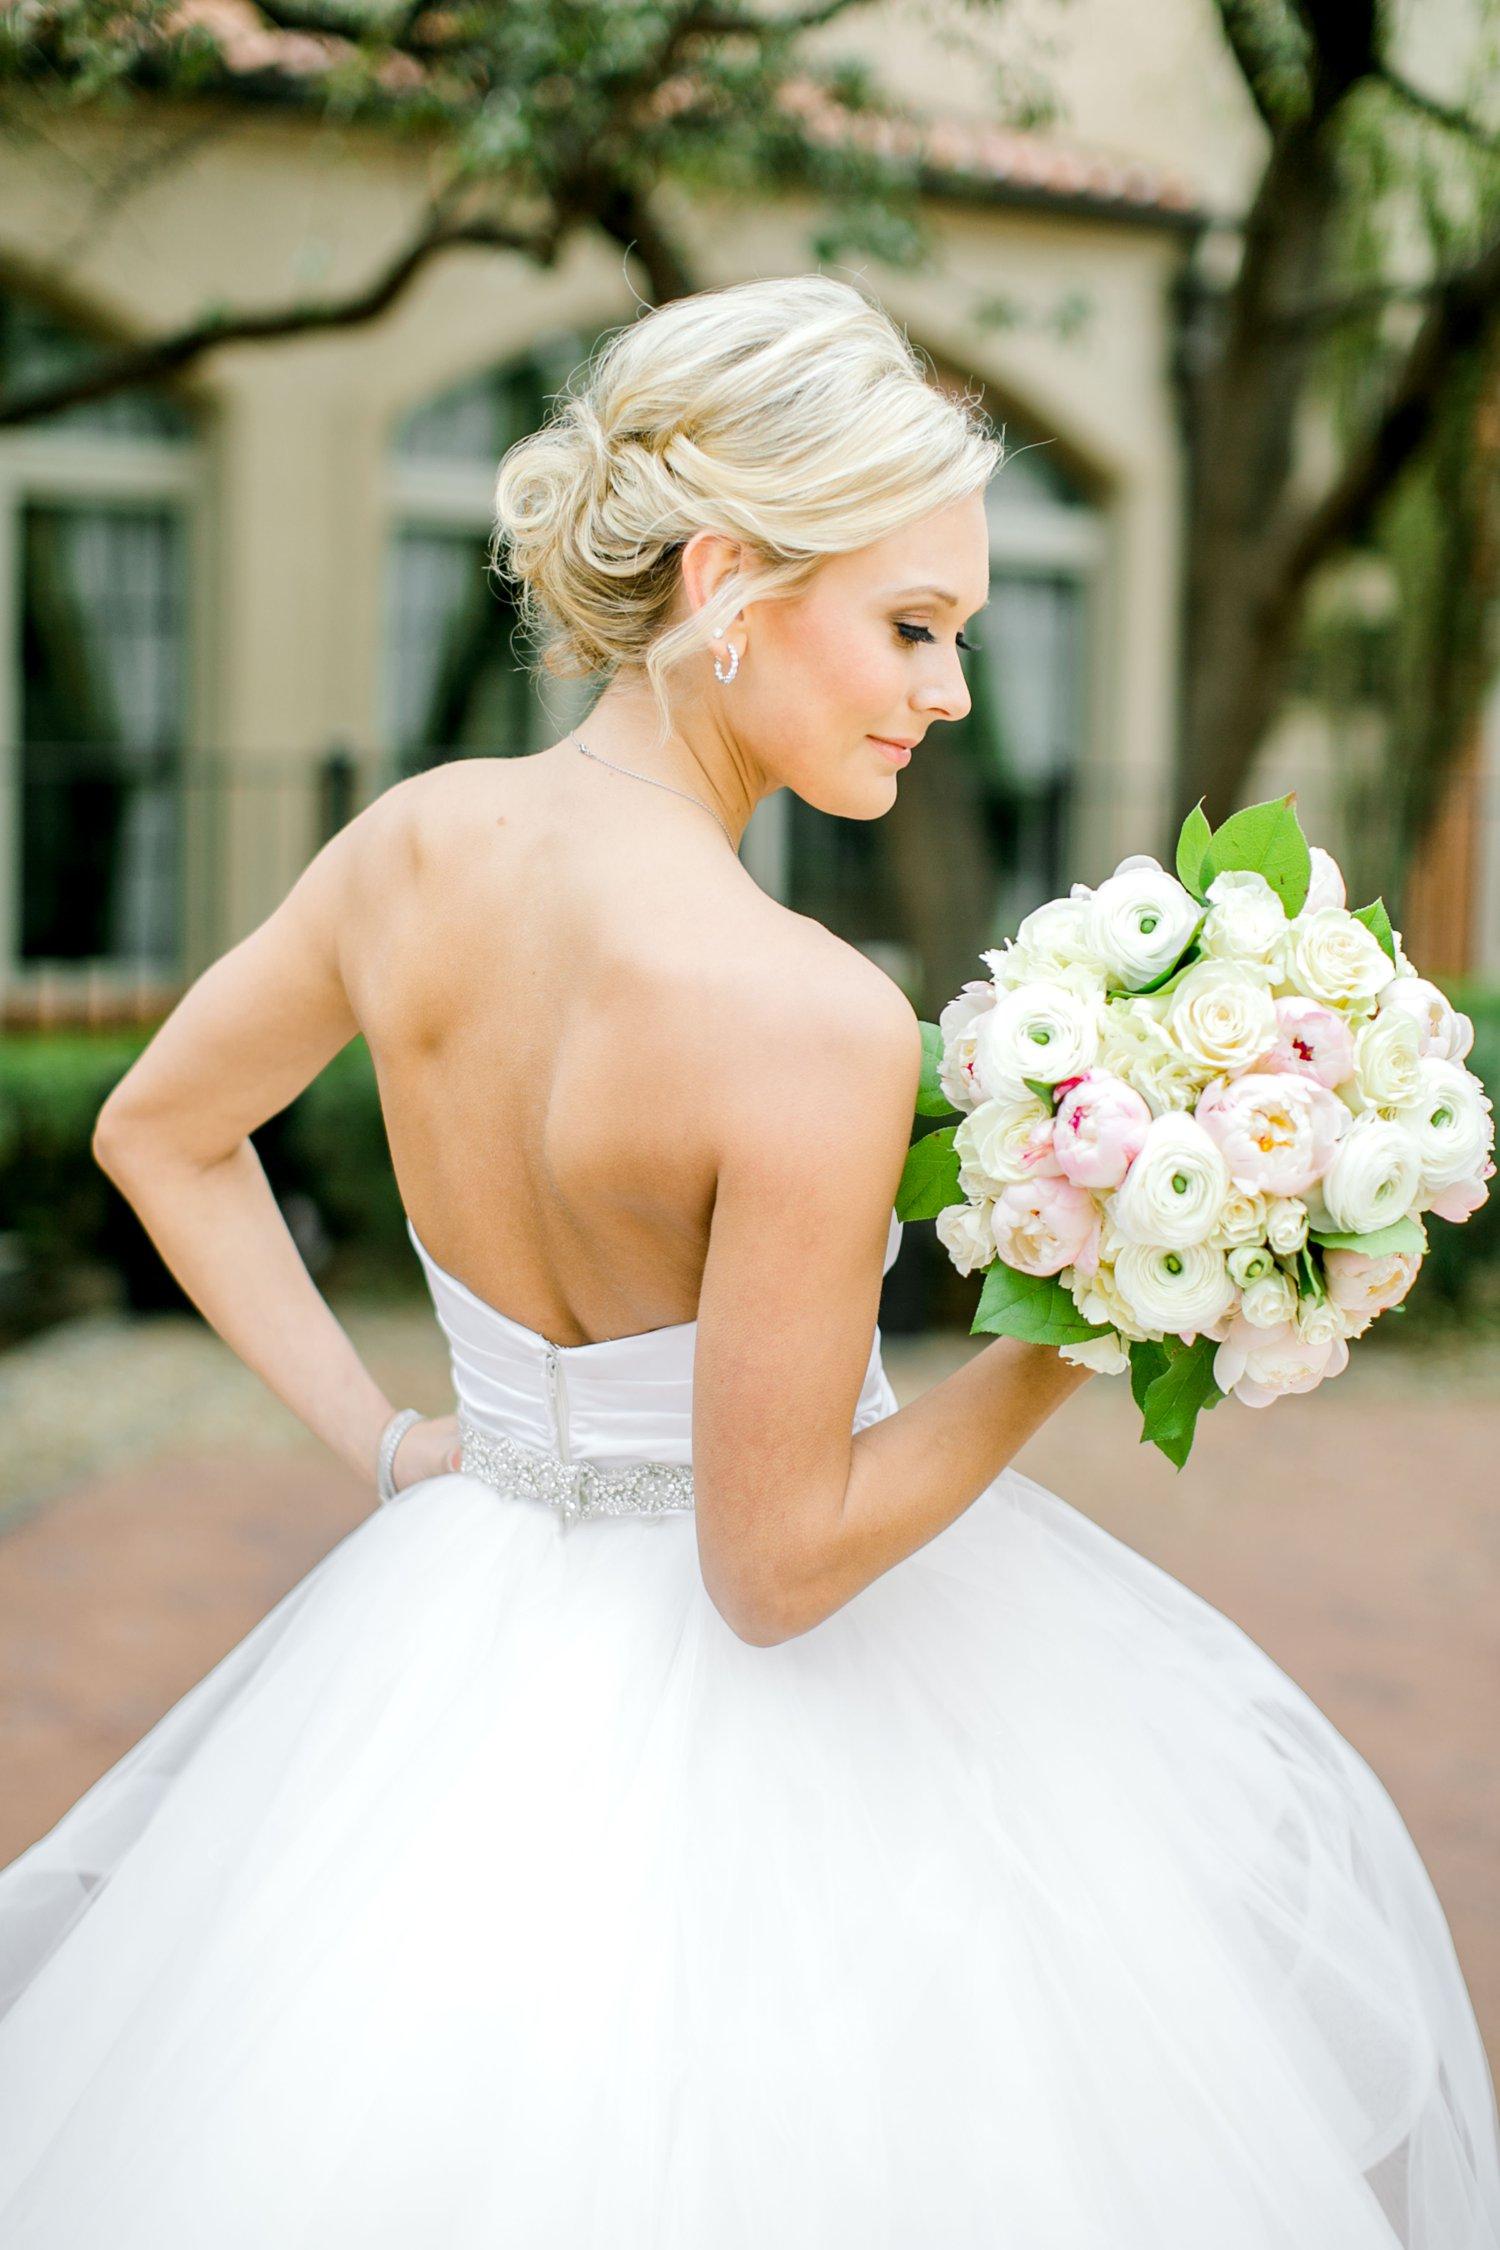 Taylor-Williams-Merket-Alumni-Center-Texas-Tech-Weddings-Lubbock-Photographer_0009.jpg